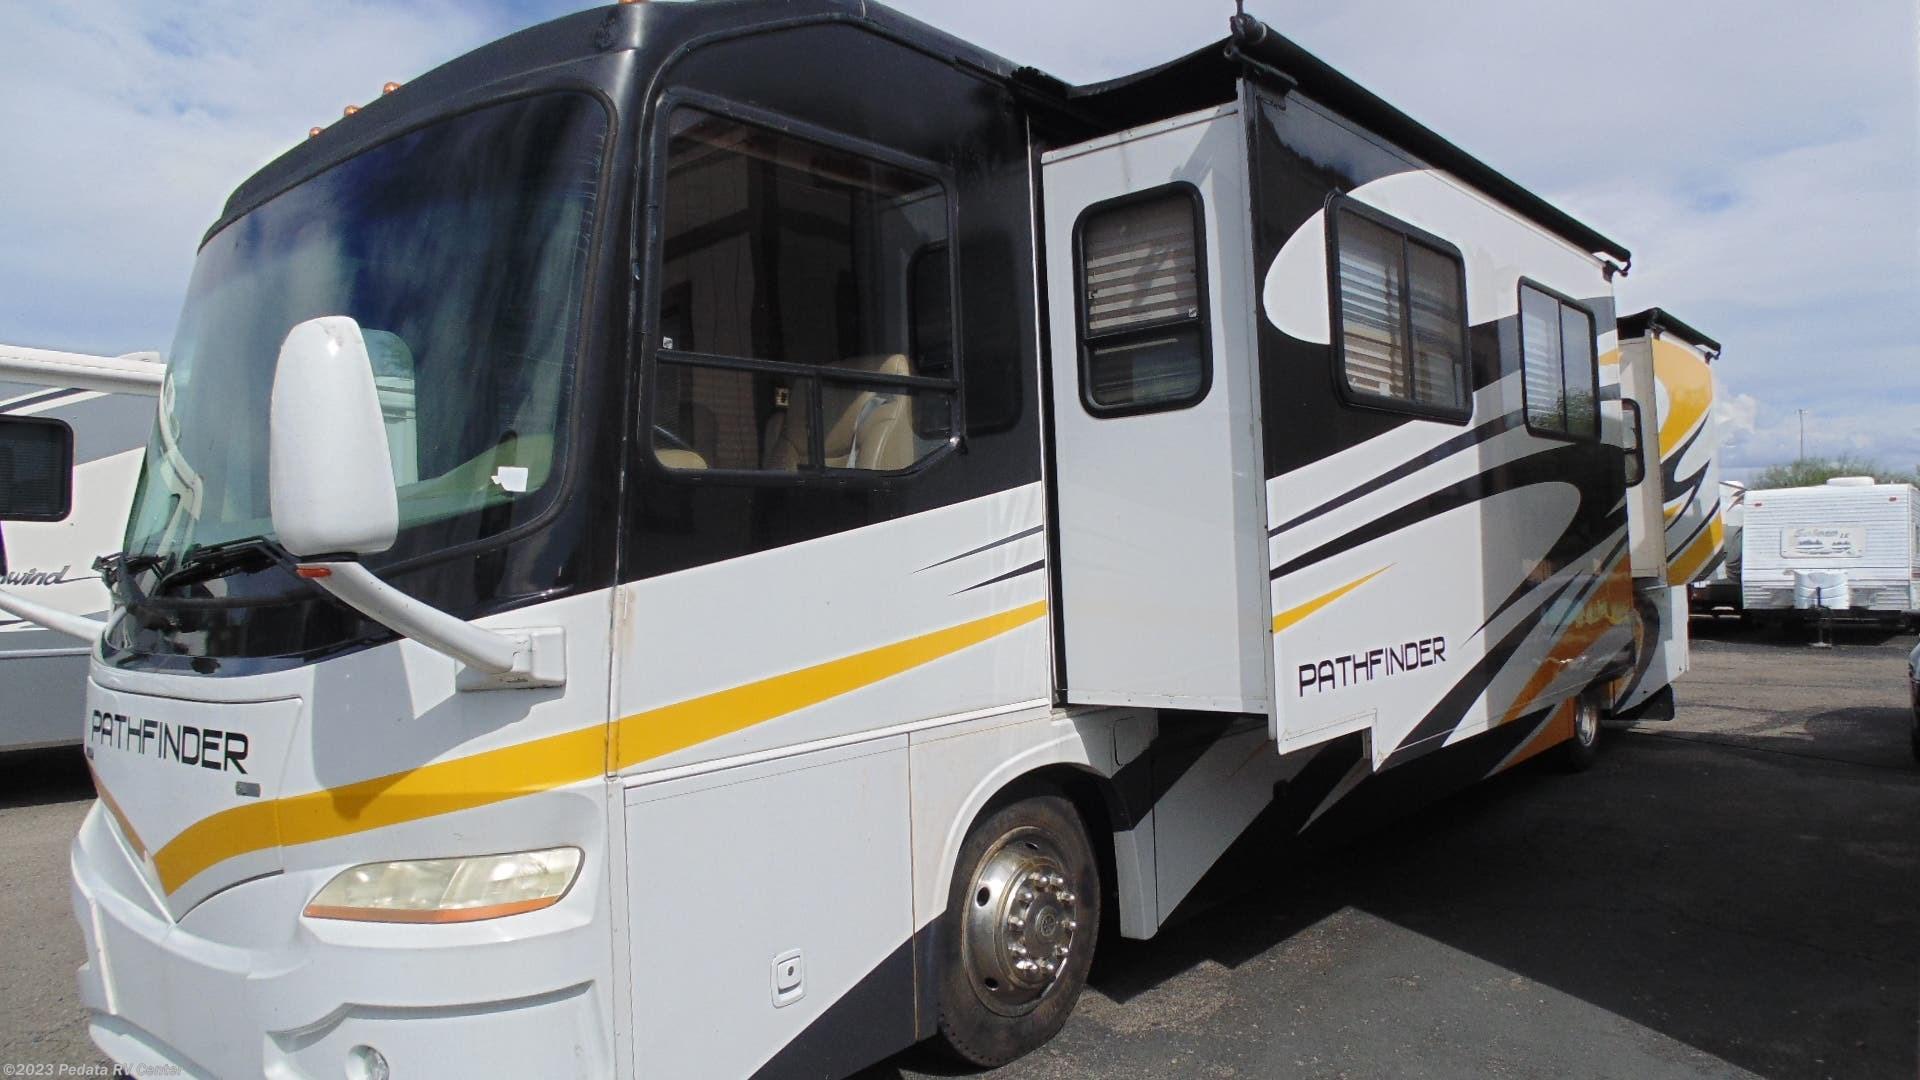 2007 Coachmen Rv Sportscoach Pathfinder 384ts W 3slds For